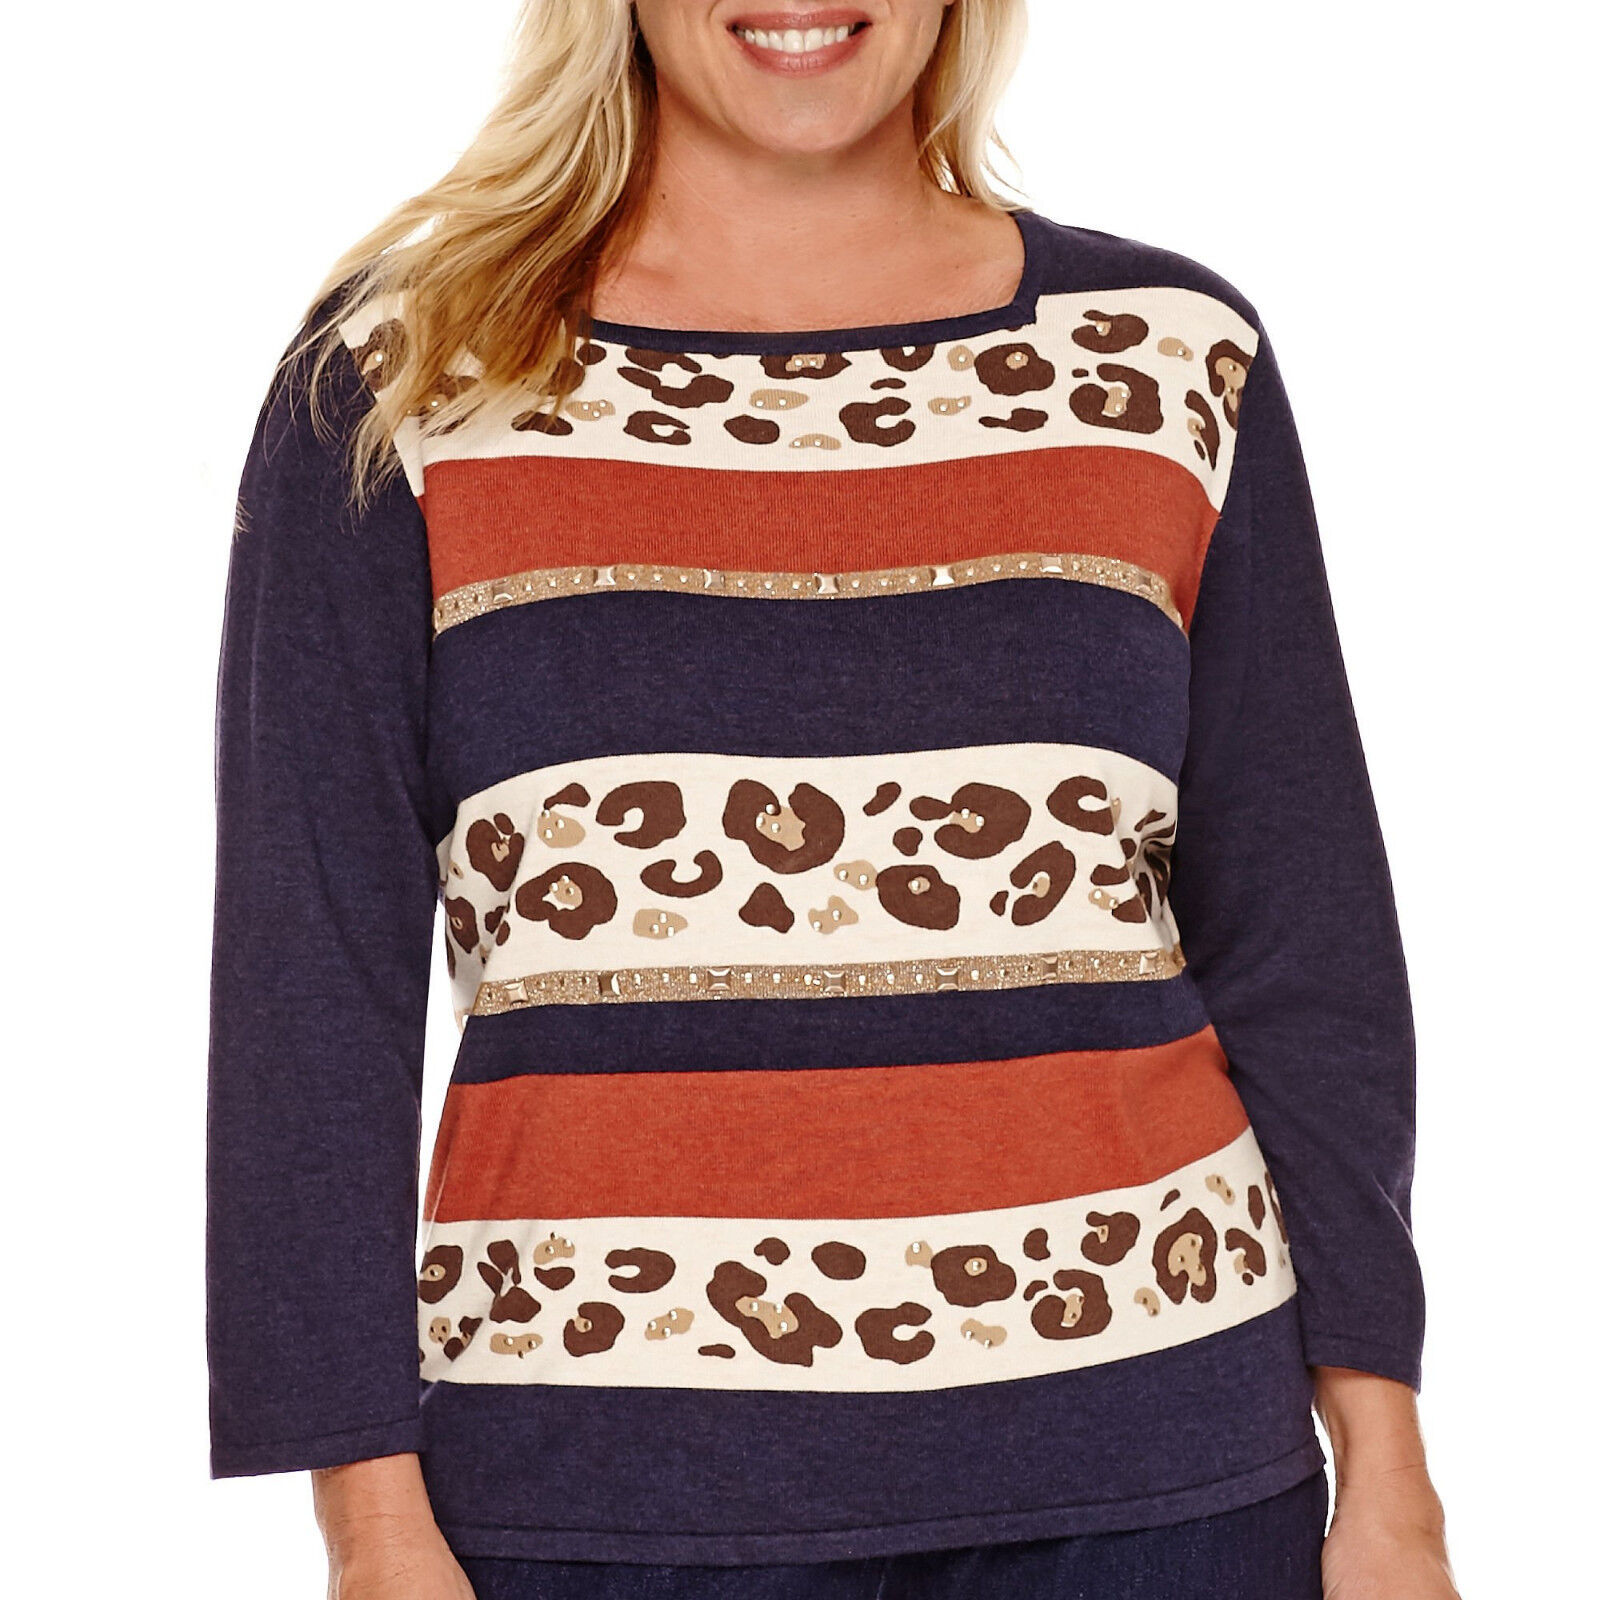 Alfred Dunner El Dorado 3 4-Sleeve Sweater Size 3X Msrp New